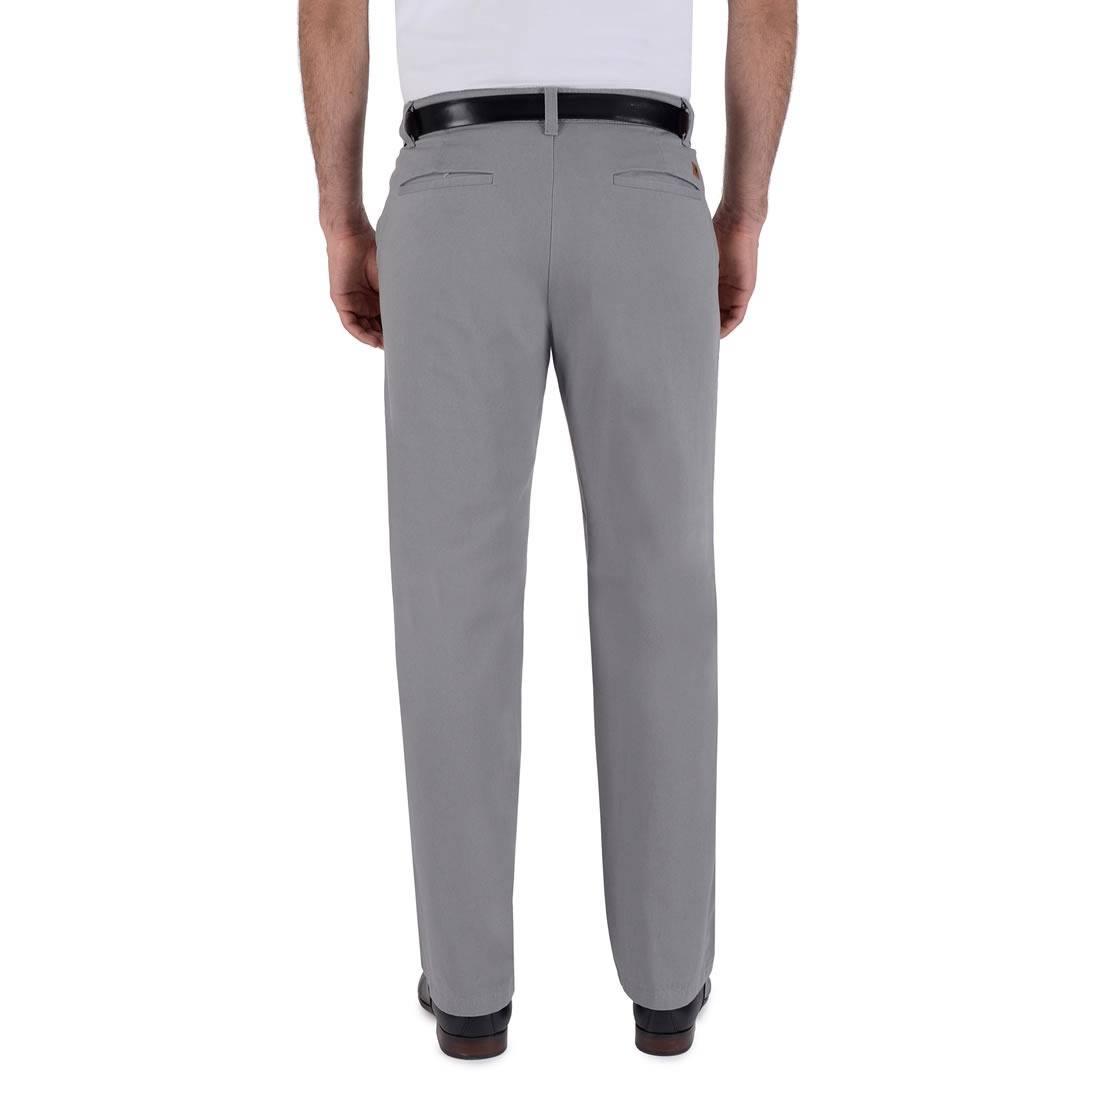 010811074406-02-Pantalon-Casual-Sin-Pinzas-Classic-Fit-Gris-yale